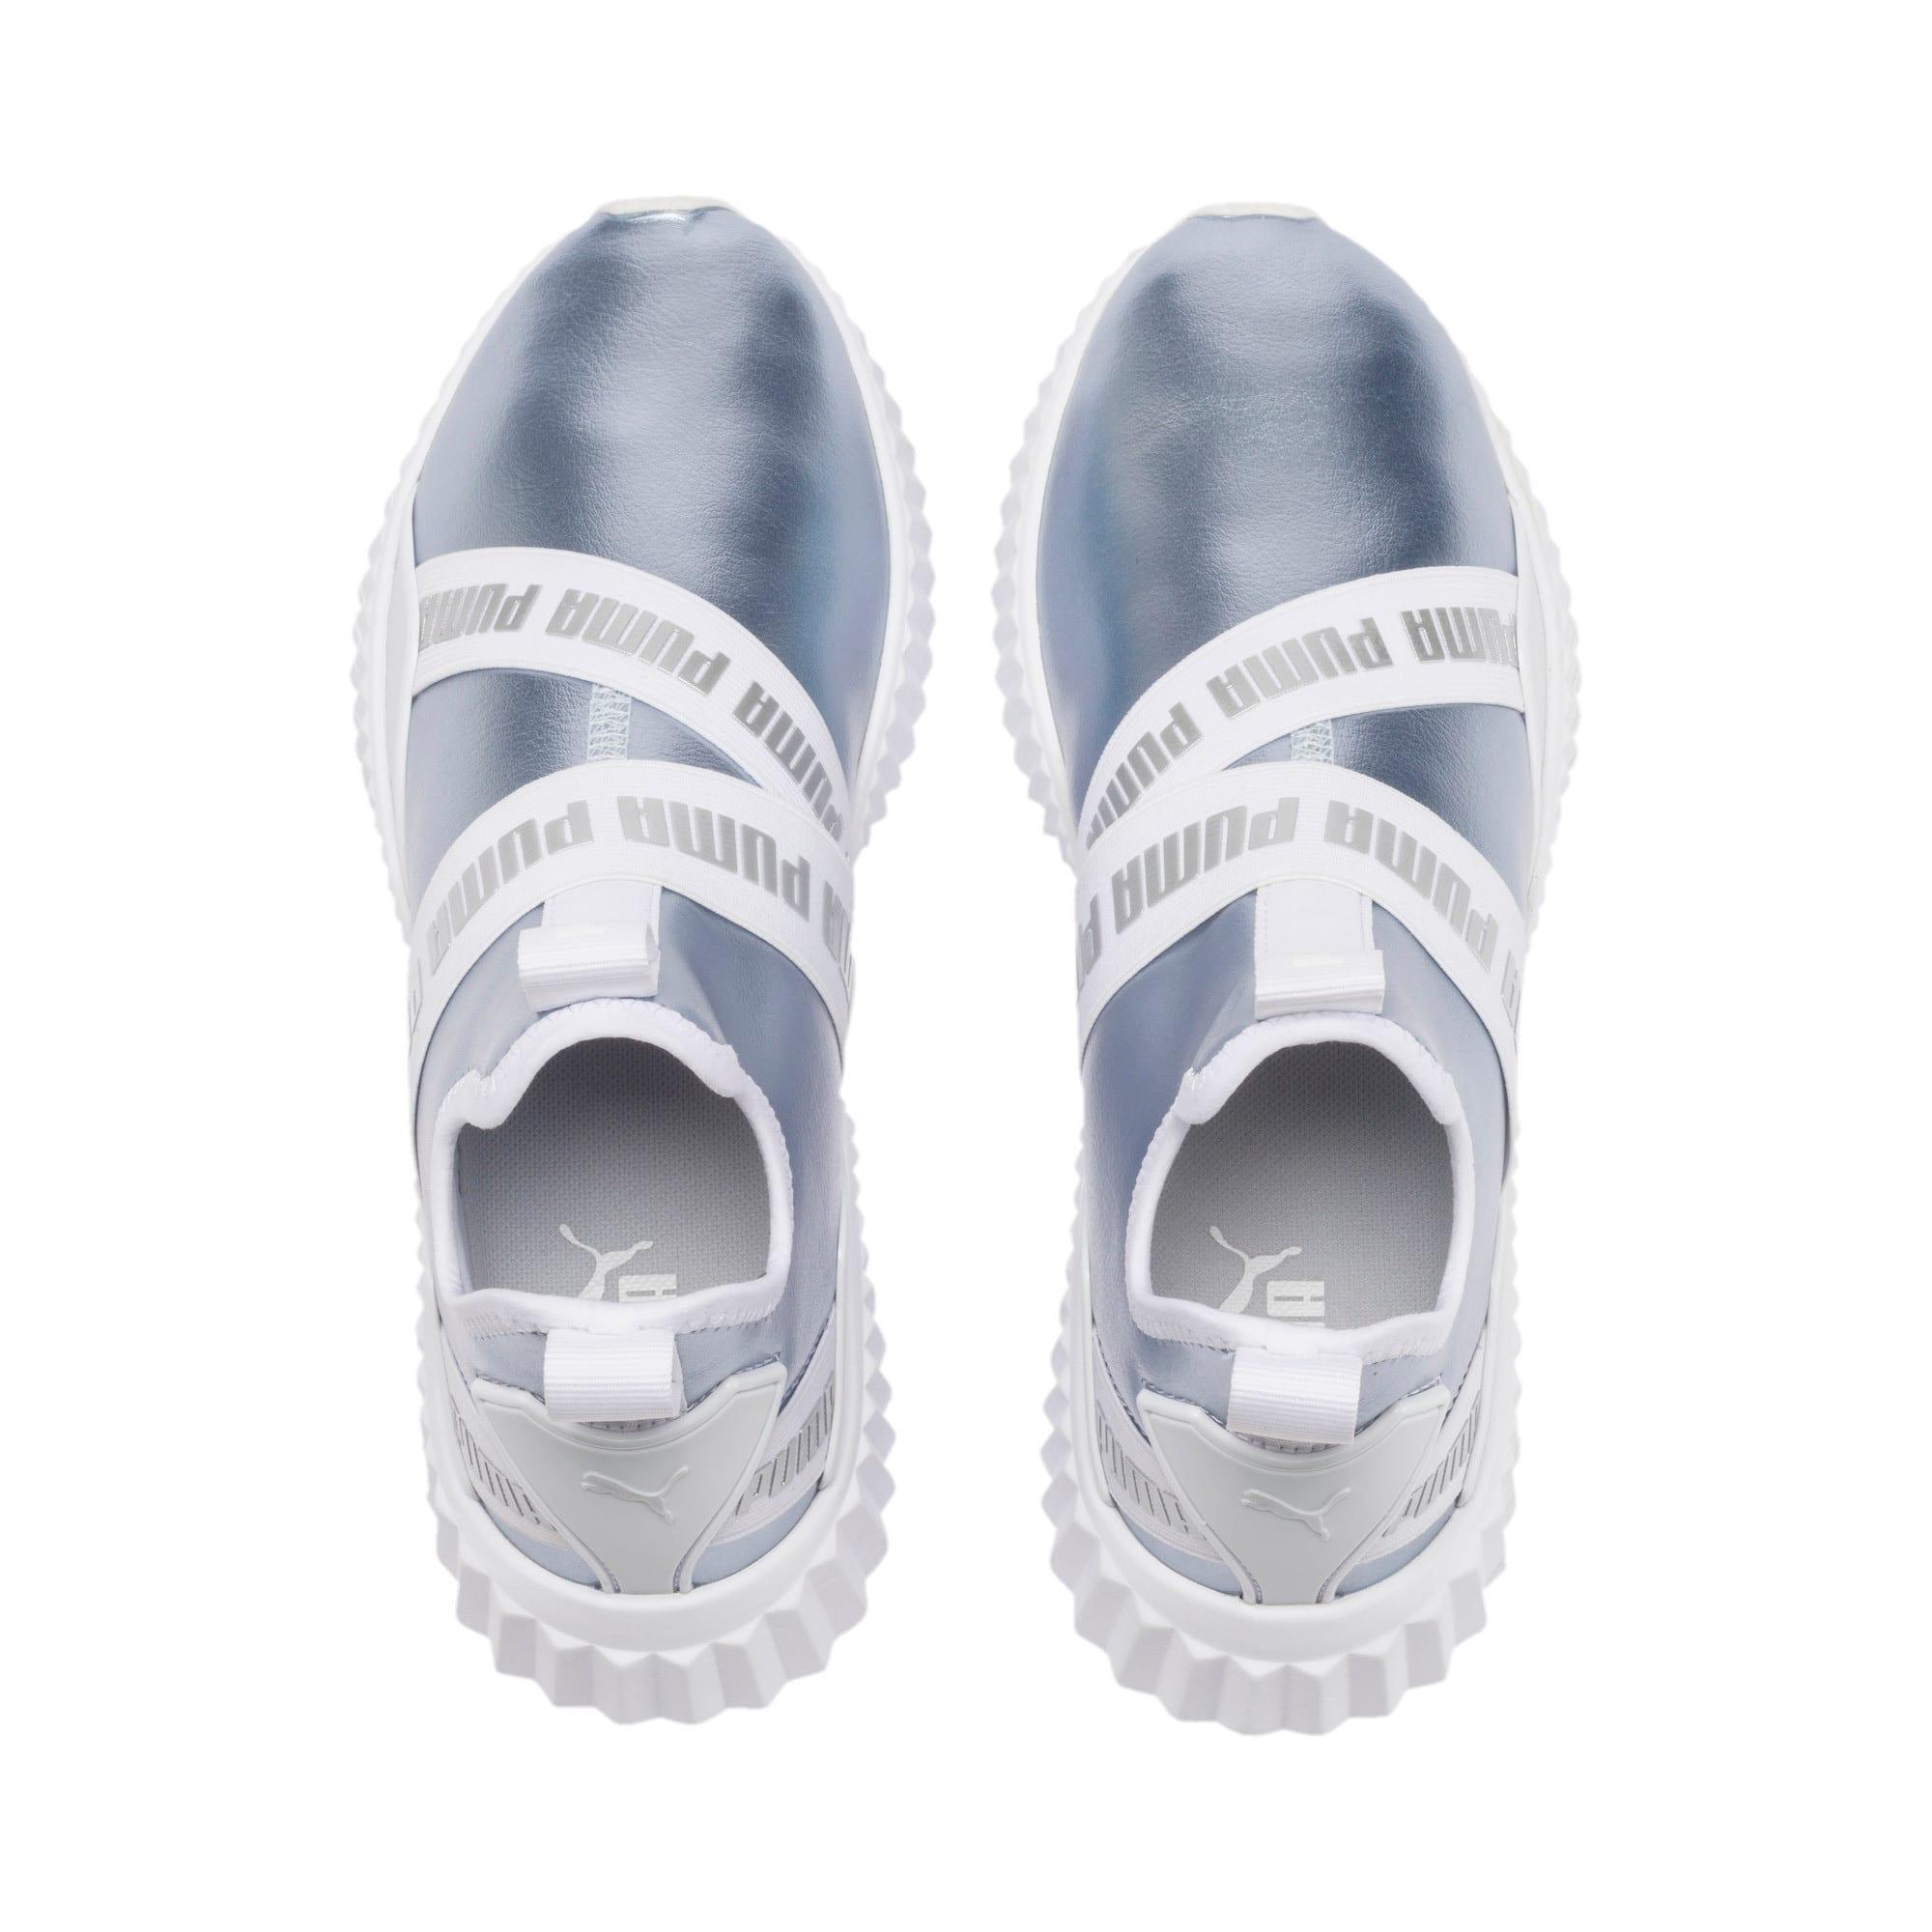 Thumbnail 7 of Defy Mid Metallic Women's Training Shoes, Heather-Puma White, medium